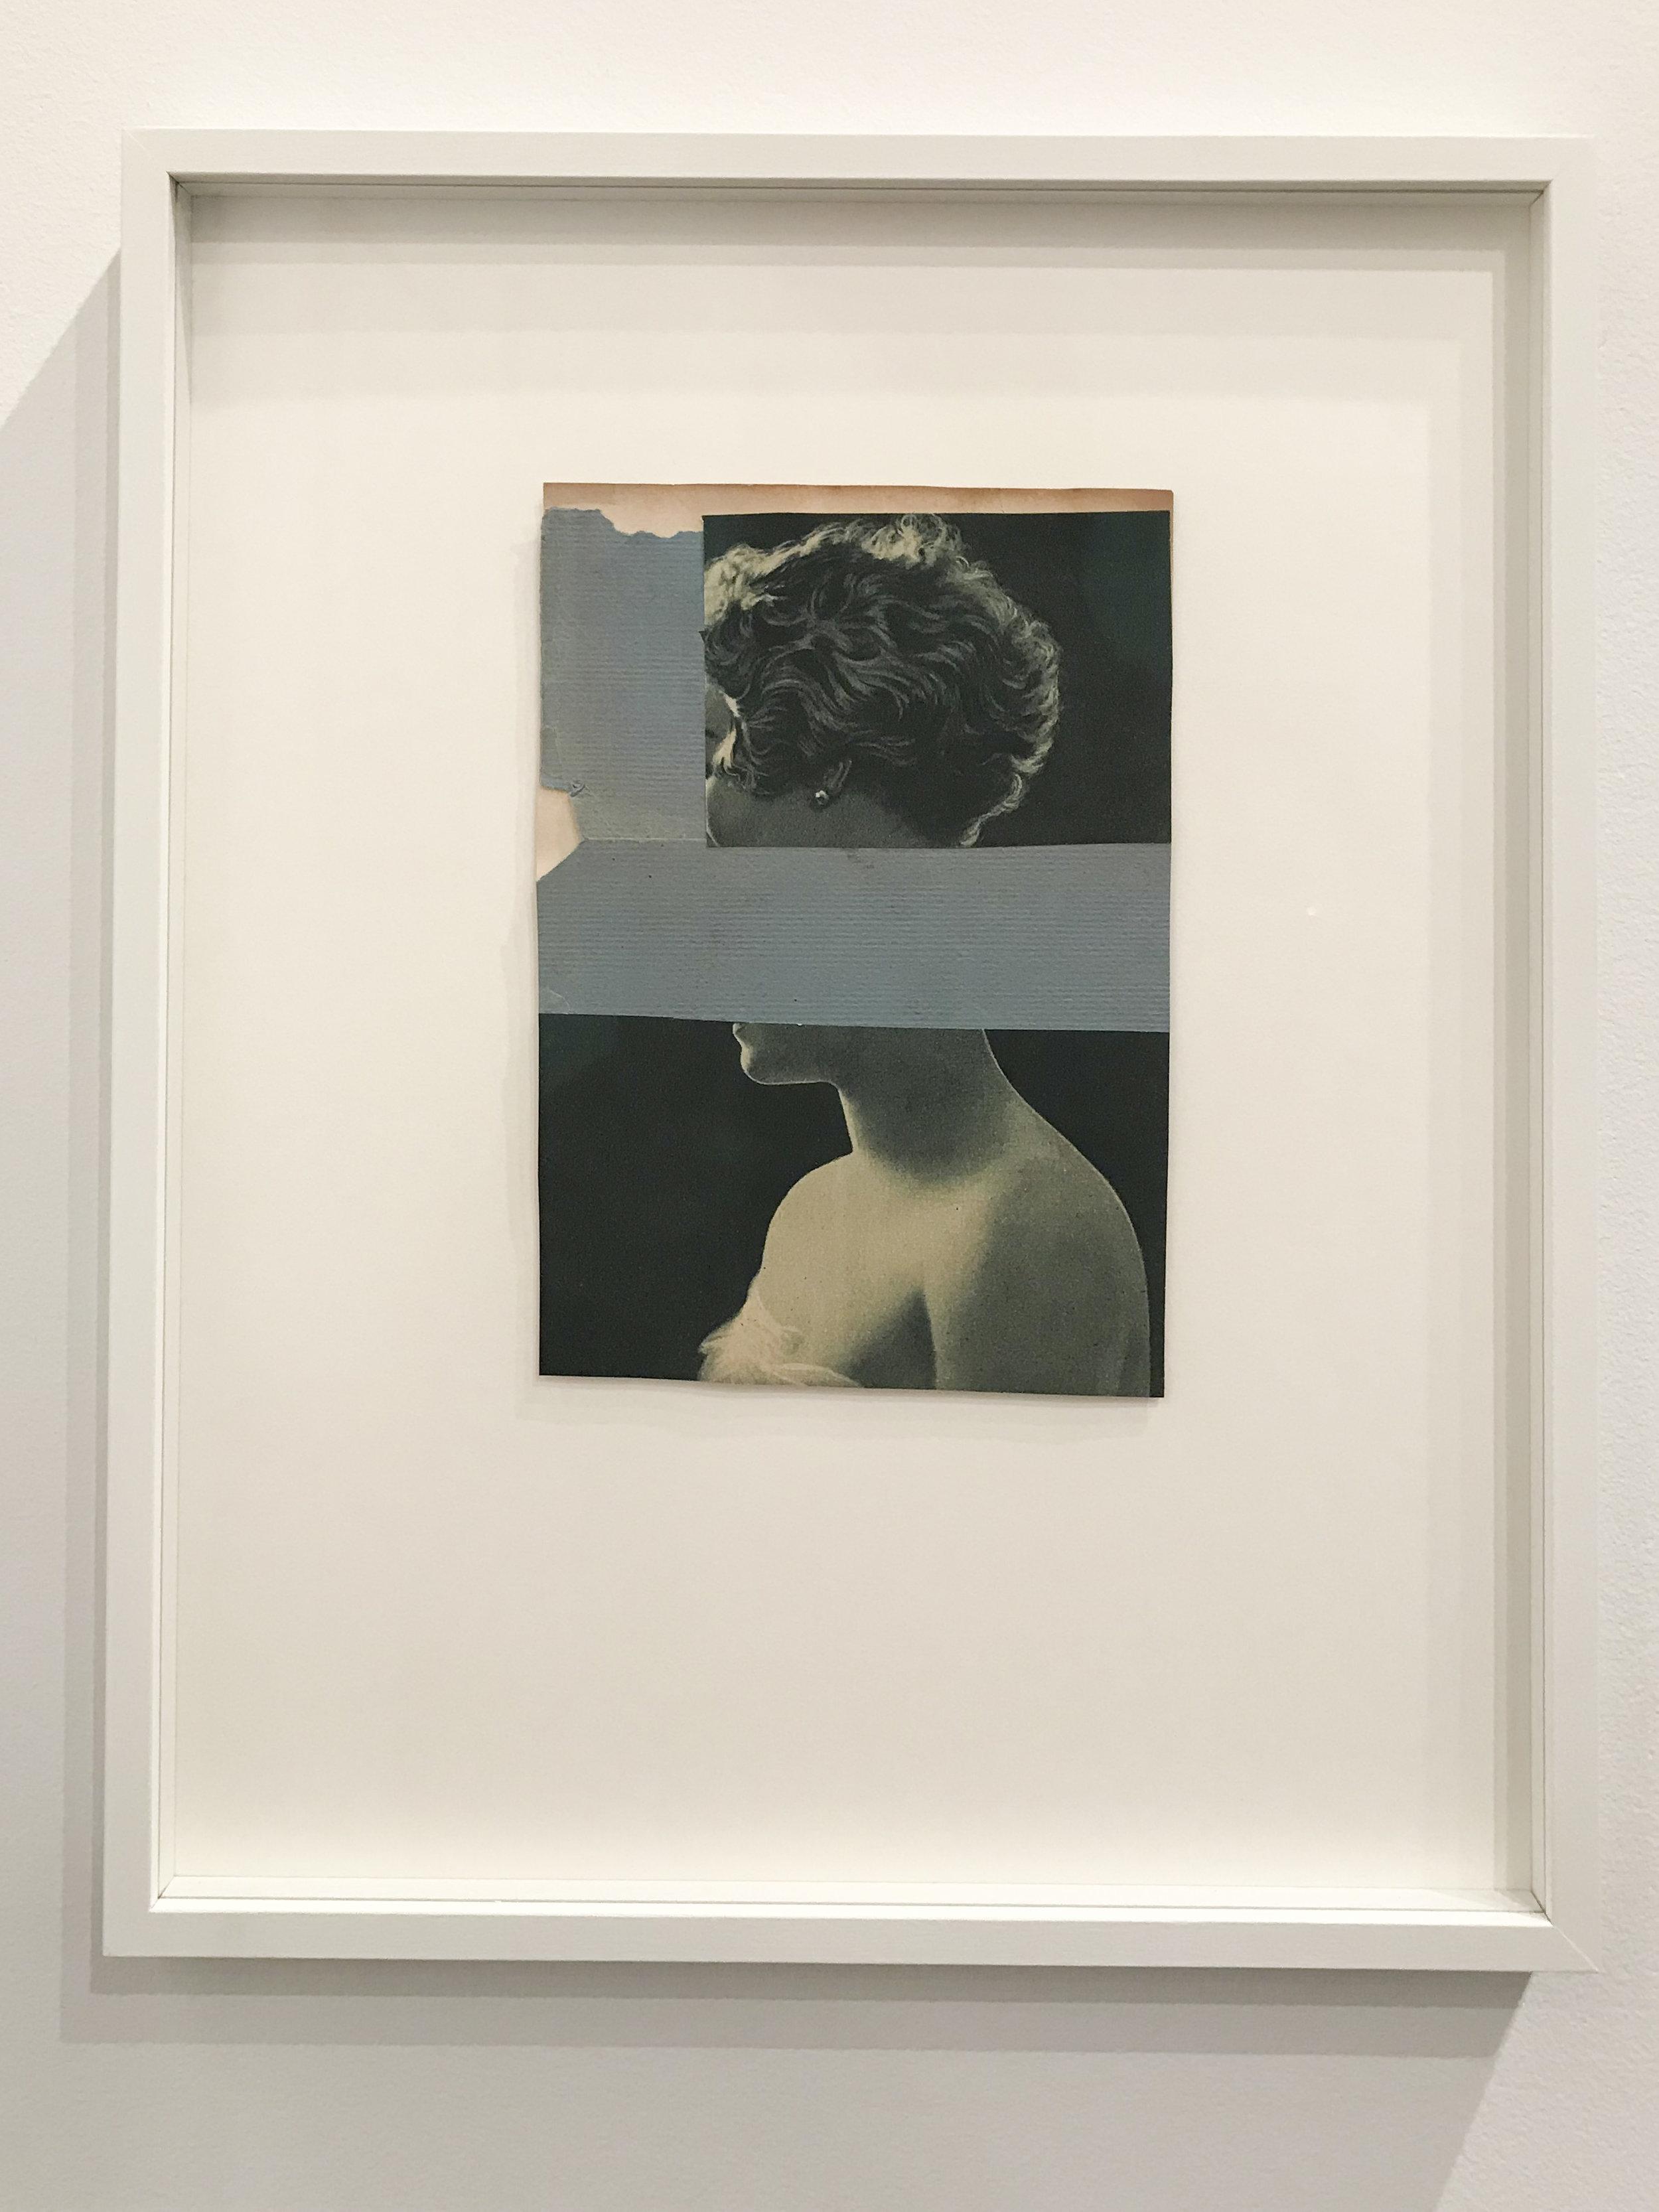 Katrien de Blauwer,  Painted Scenes , 2017, collage, 15 x 12 inches. On view at Galerie Les Filles du Calvaire (Booth 306).